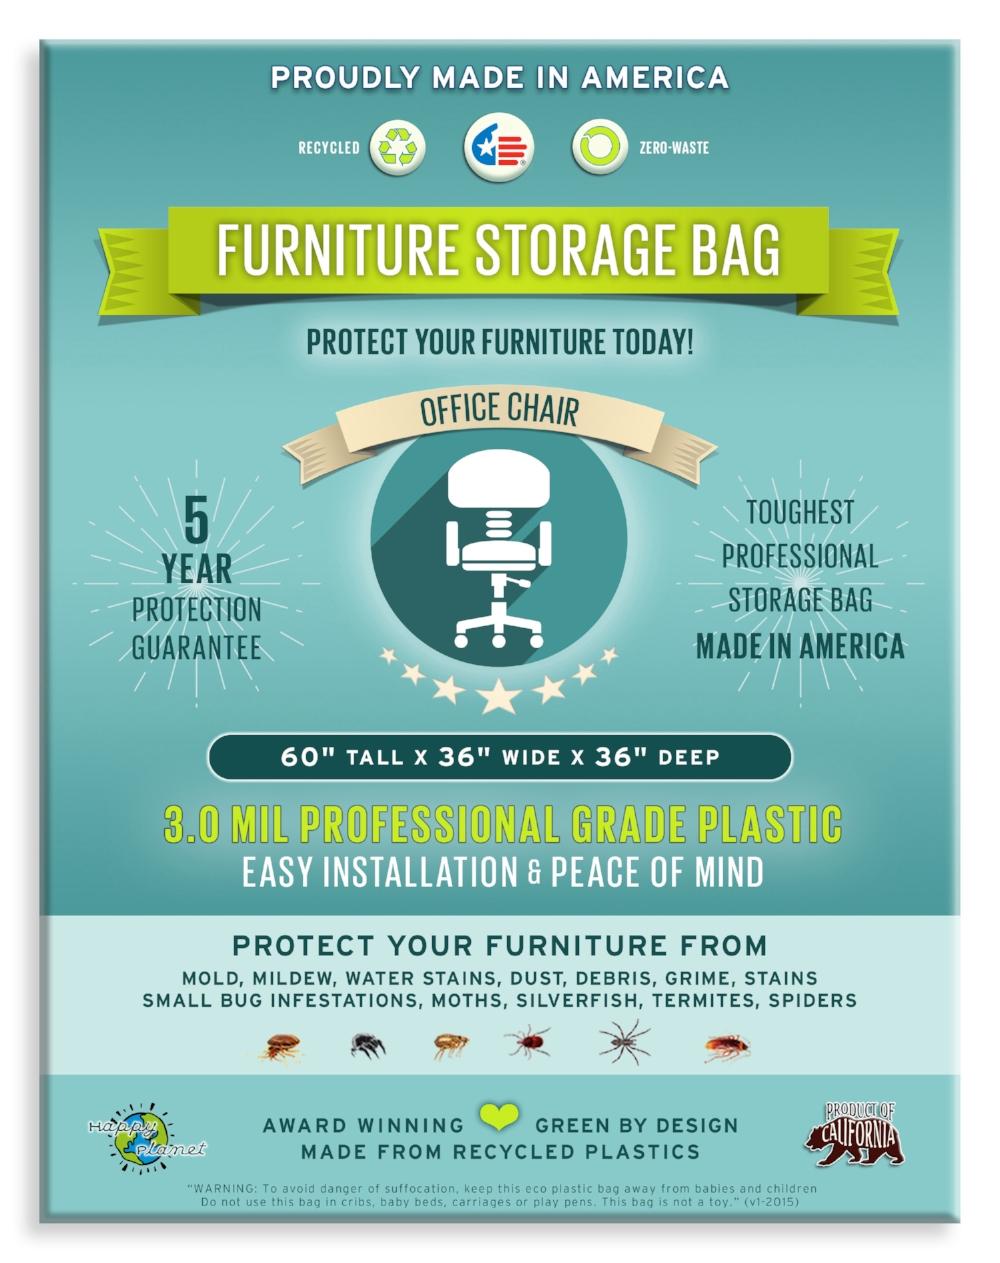 Office Chair Furniture Storage Bag copy.jpg